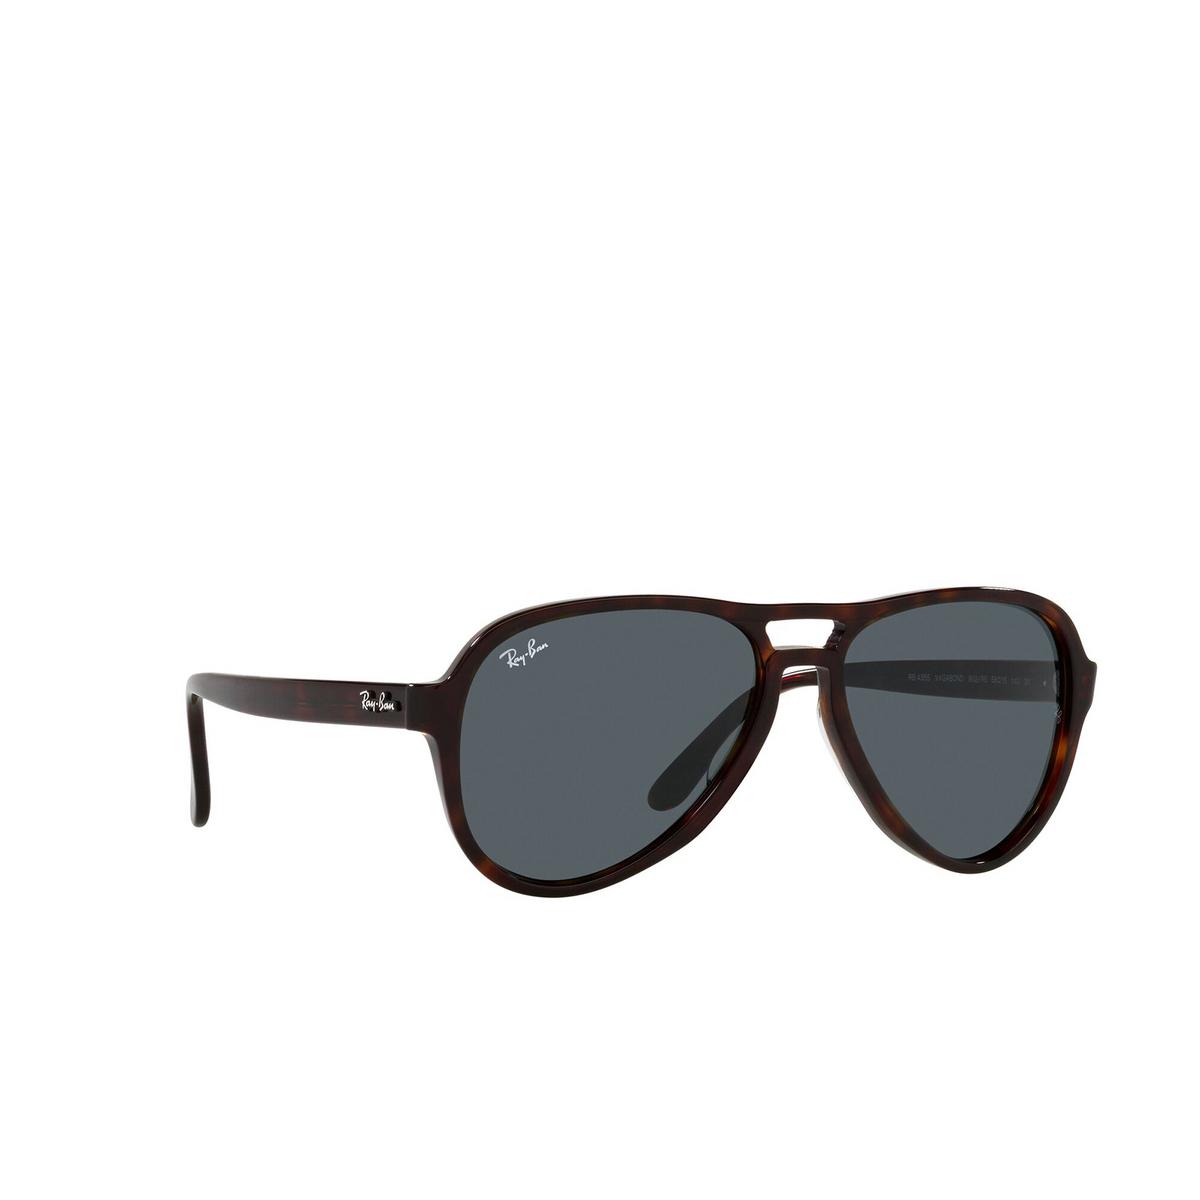 Ray-Ban® Aviator Sunglasses: Vagabond RB4355 color Havana 902/R5 - three-quarters view.